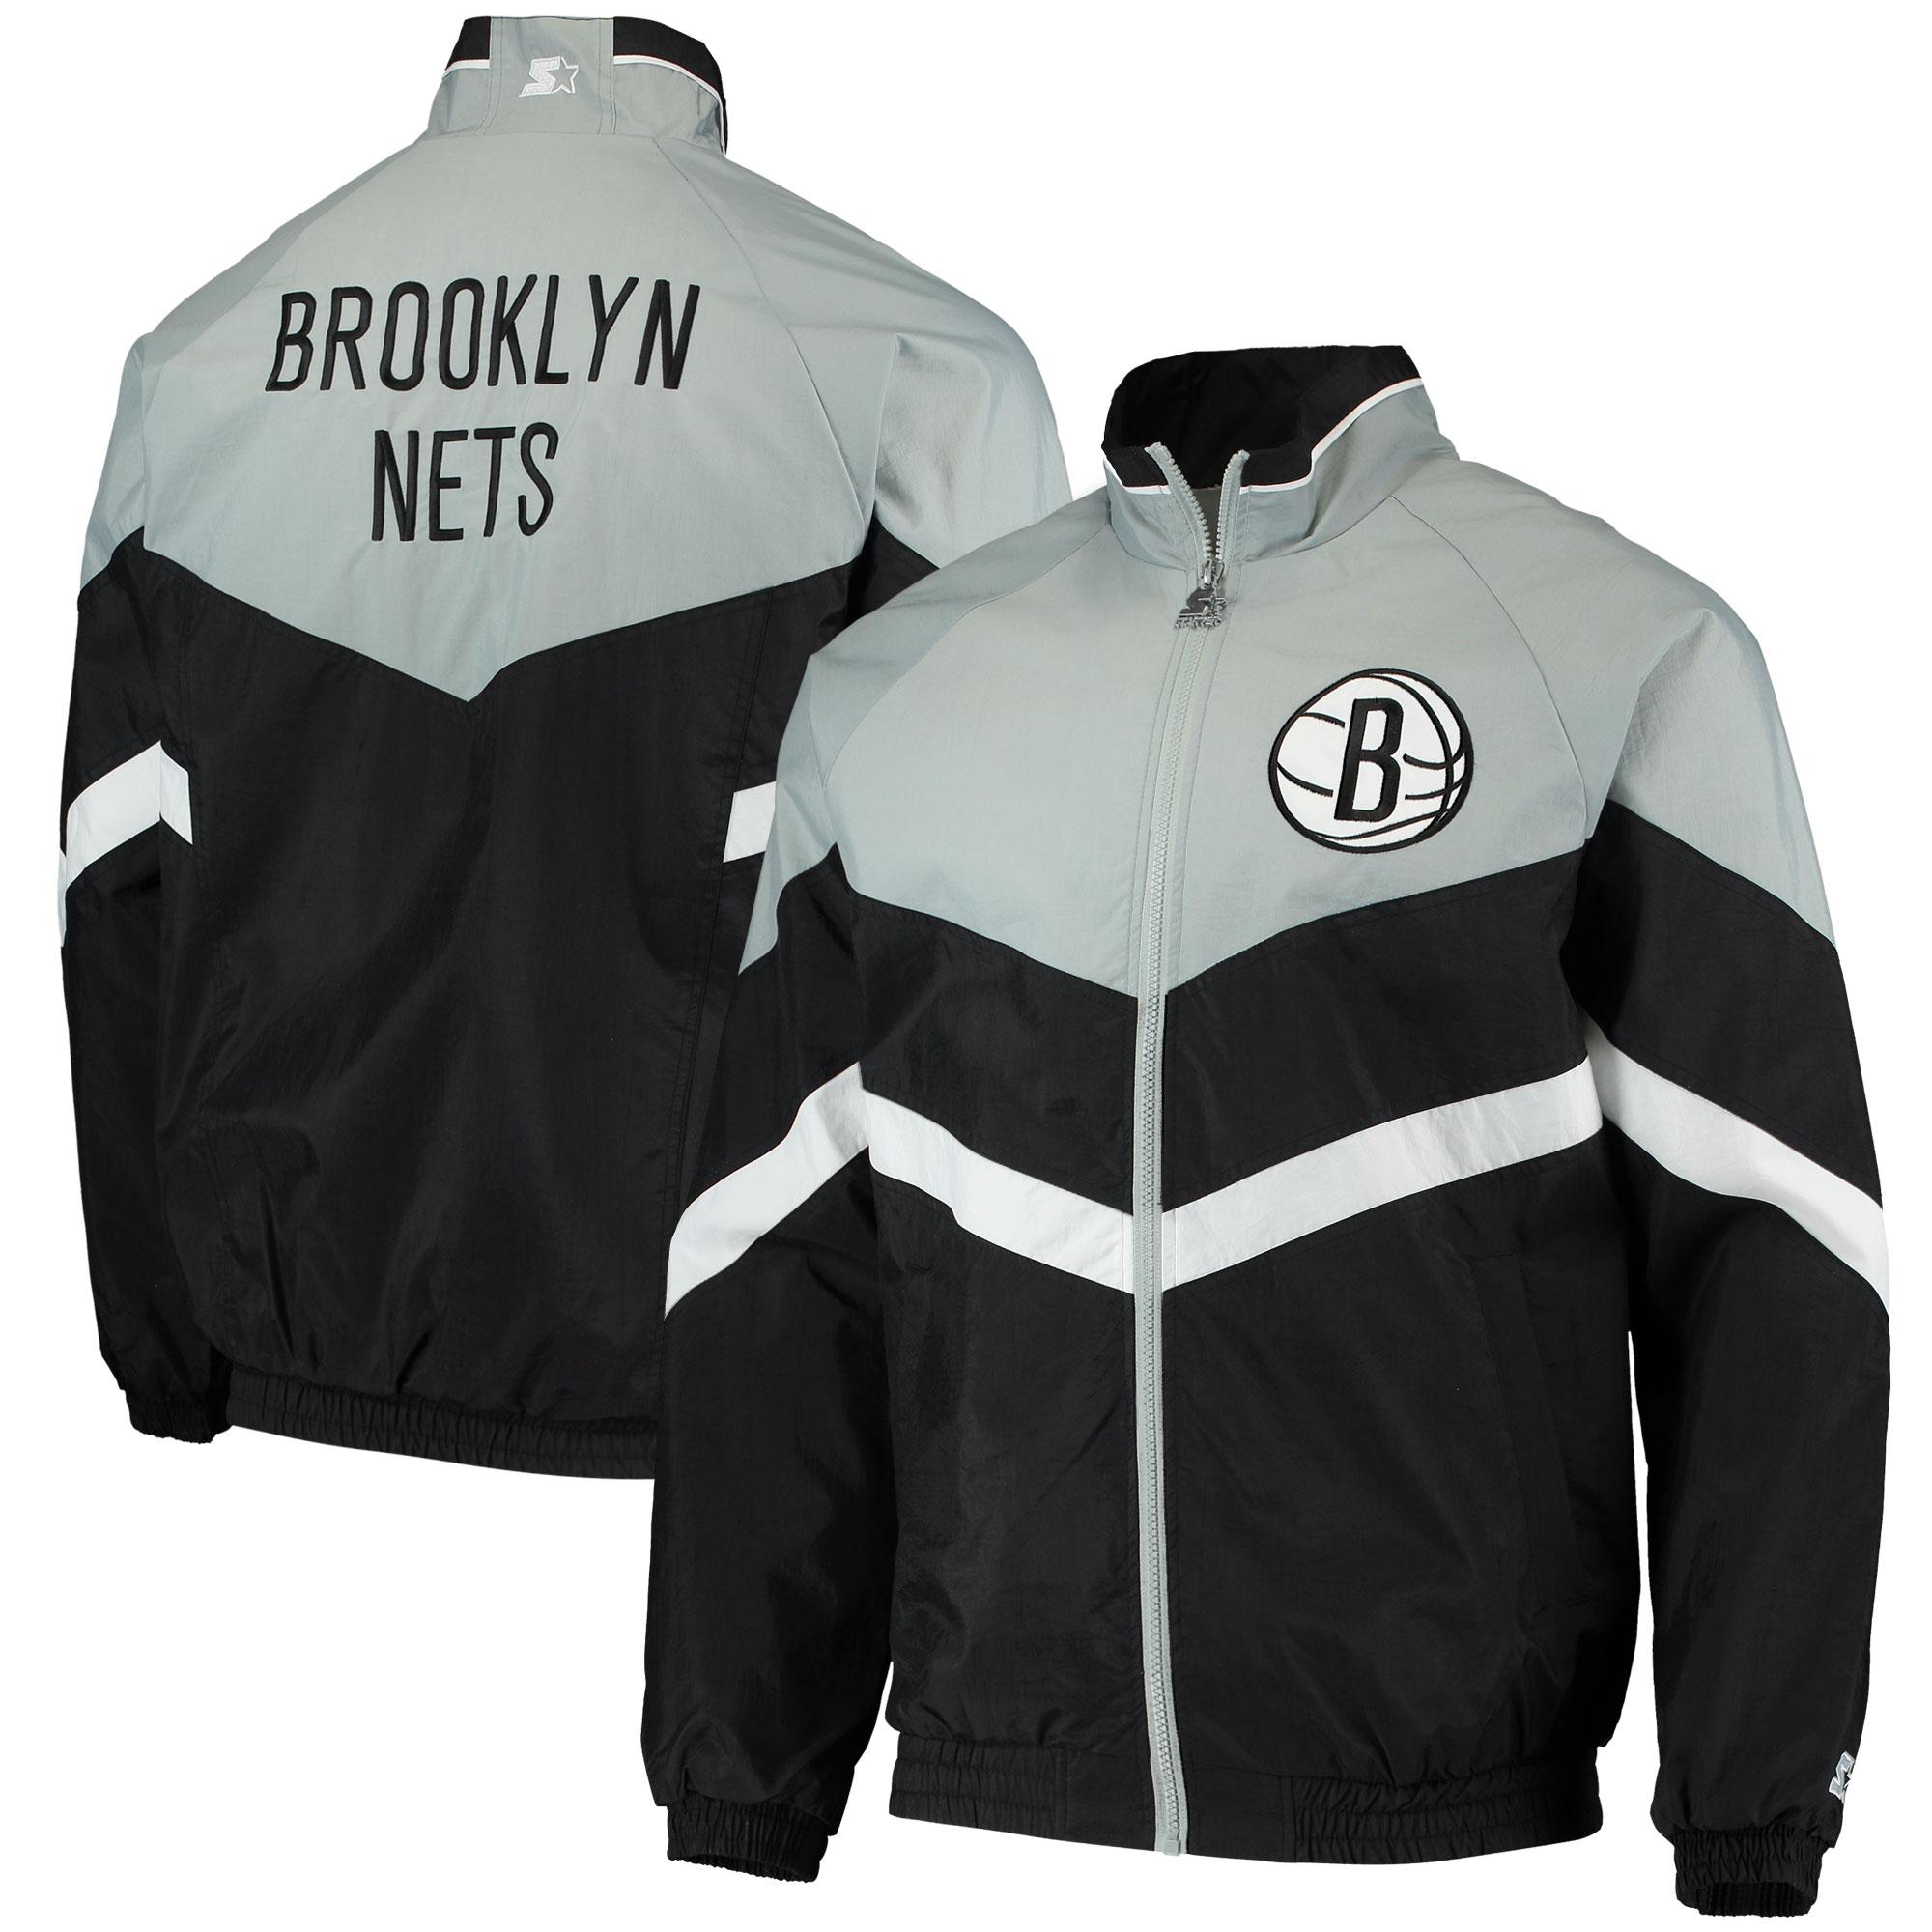 Brooklyn Nets Starter Bank Shot Oxford Full-Zip Jacket - Black/Gray